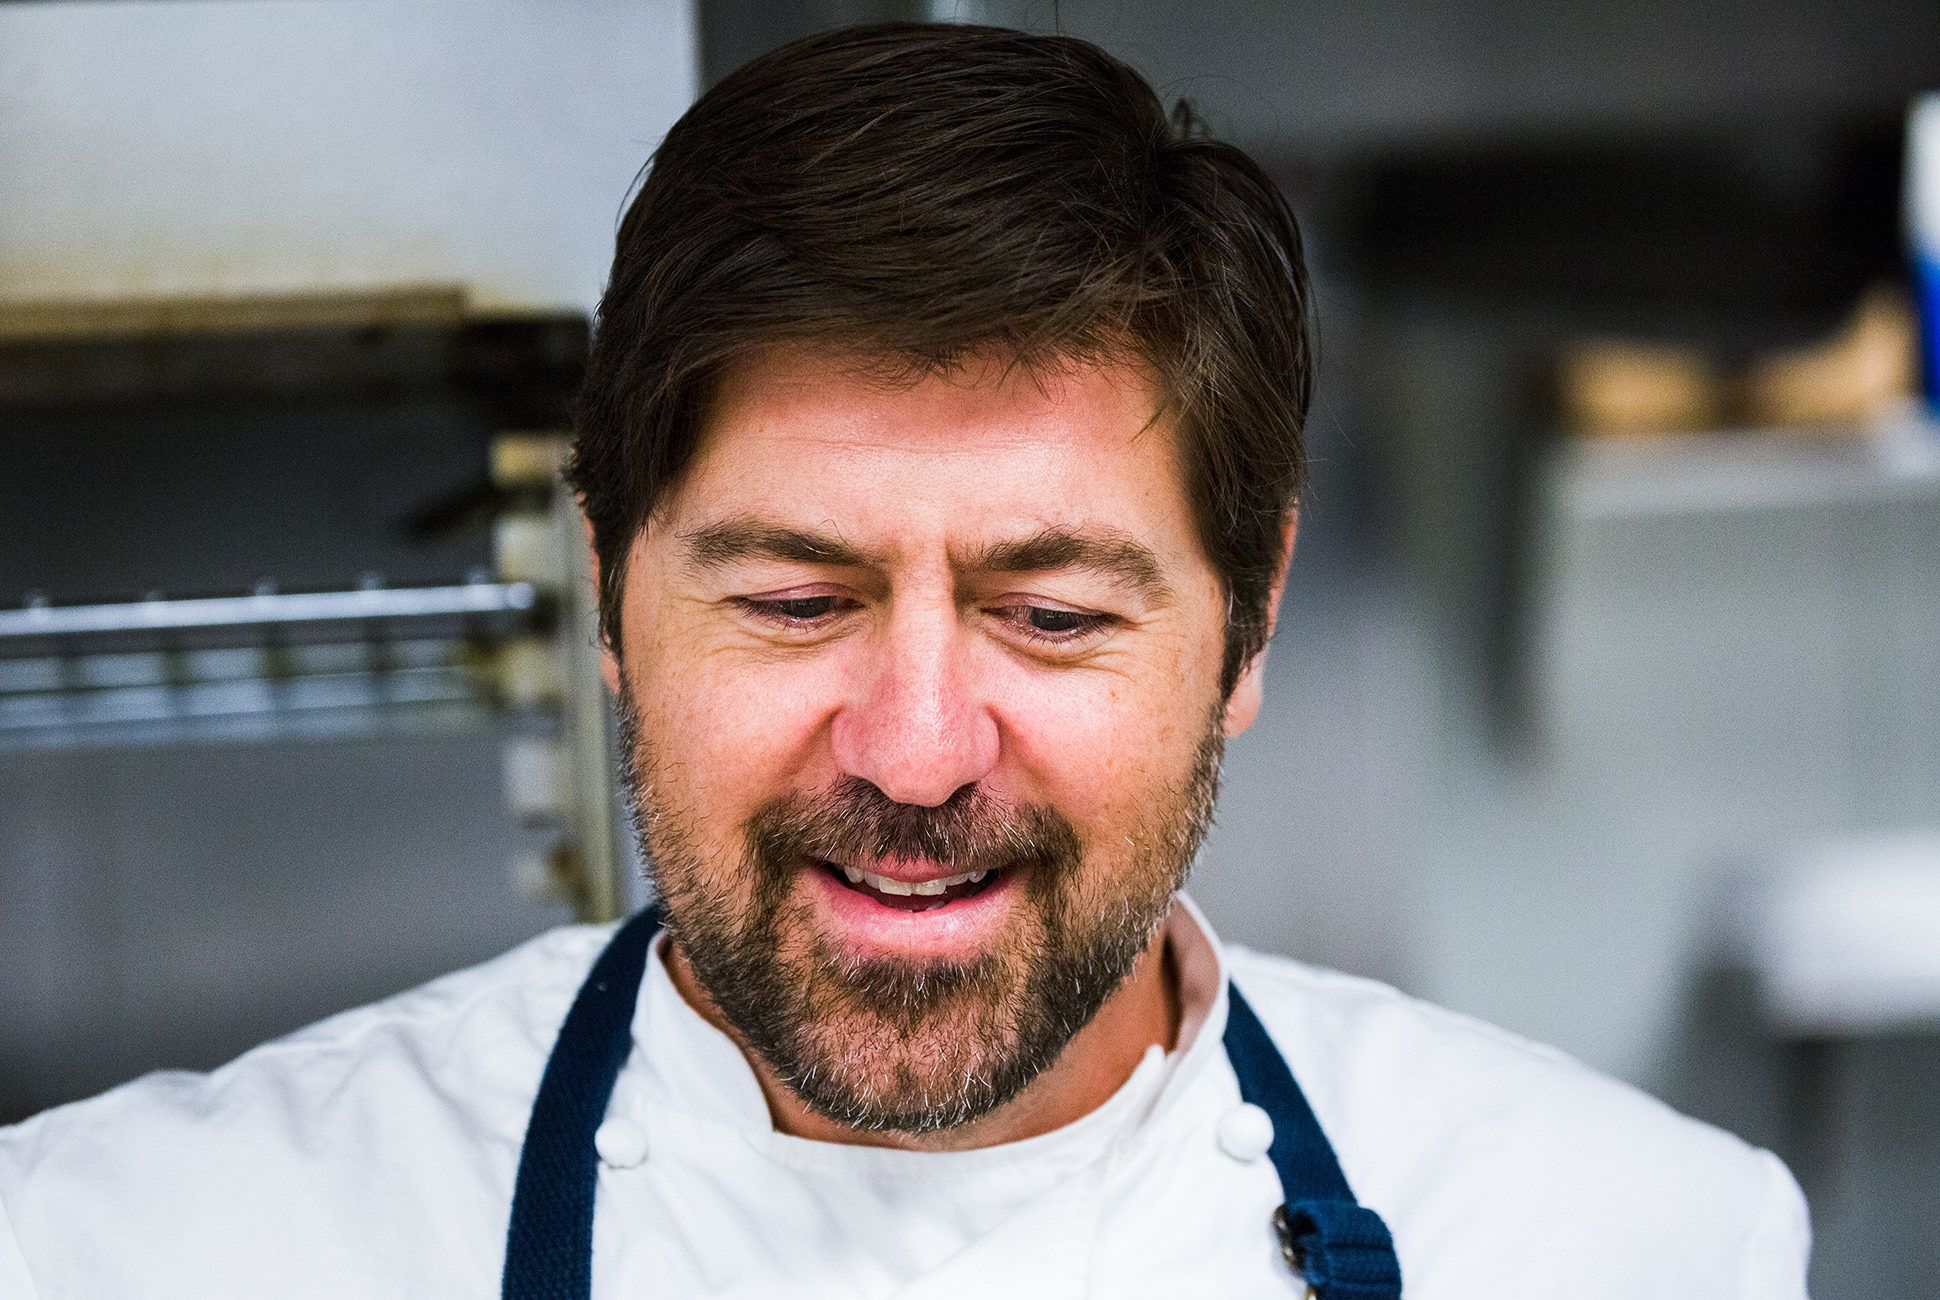 Mike-Lata-Charleston-Seafood-Gear-Patrol-Ordinary-5